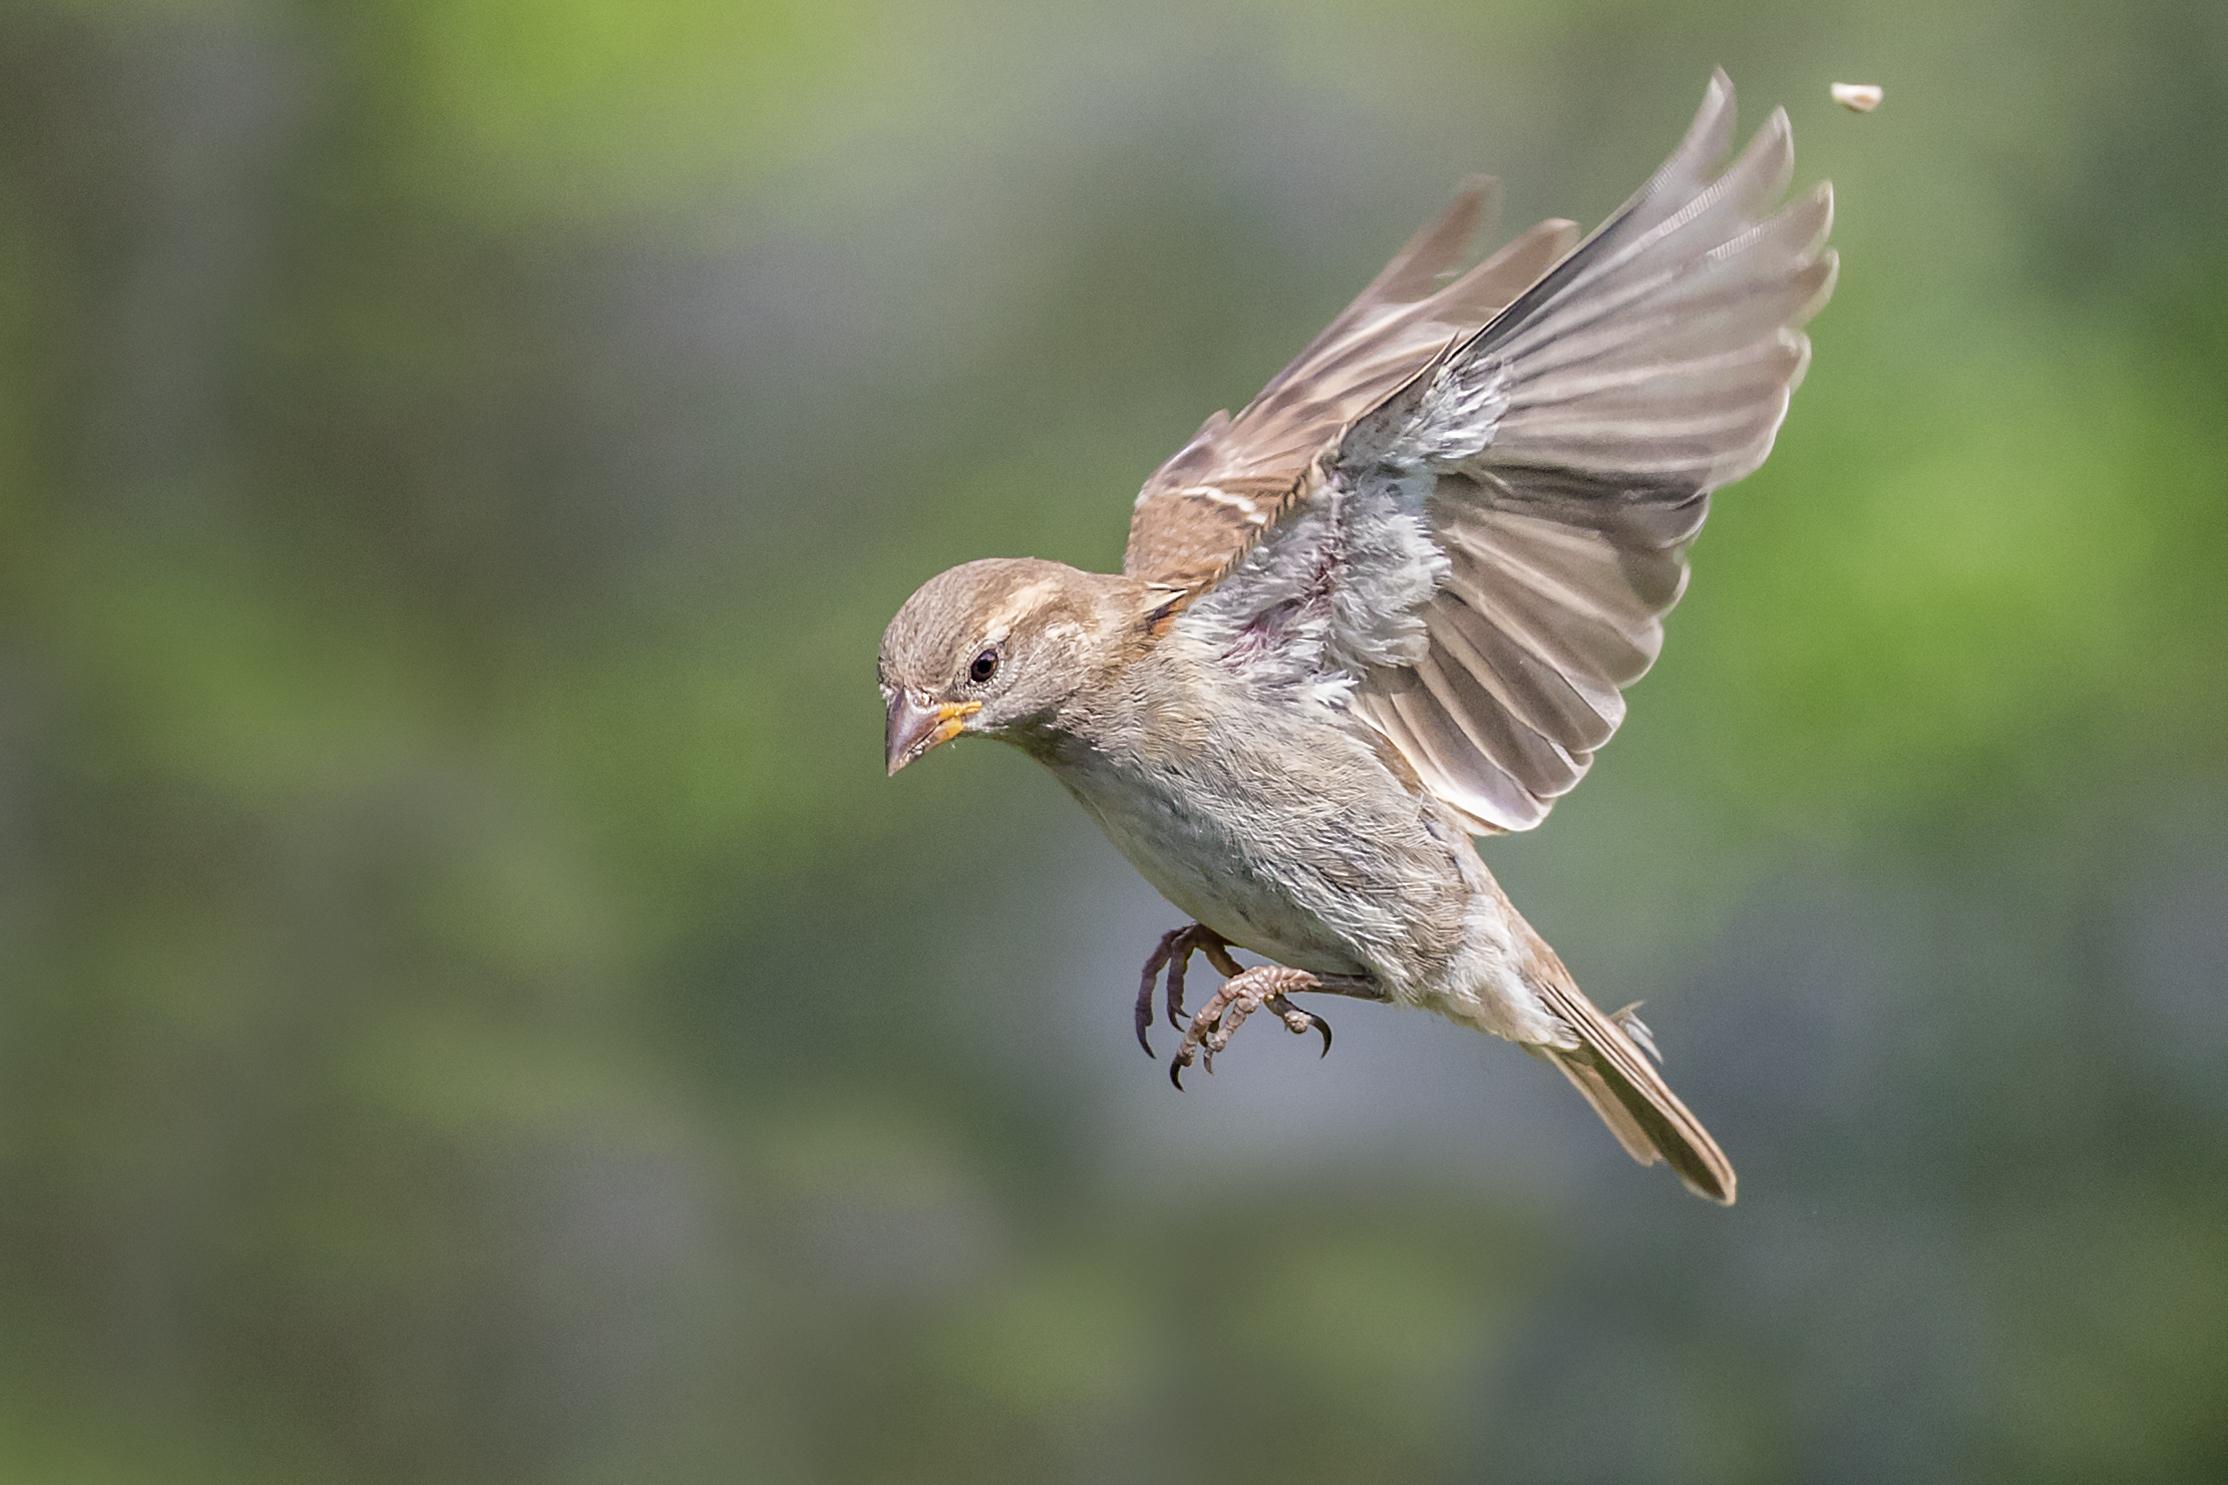 Female Sparrow preparing to land